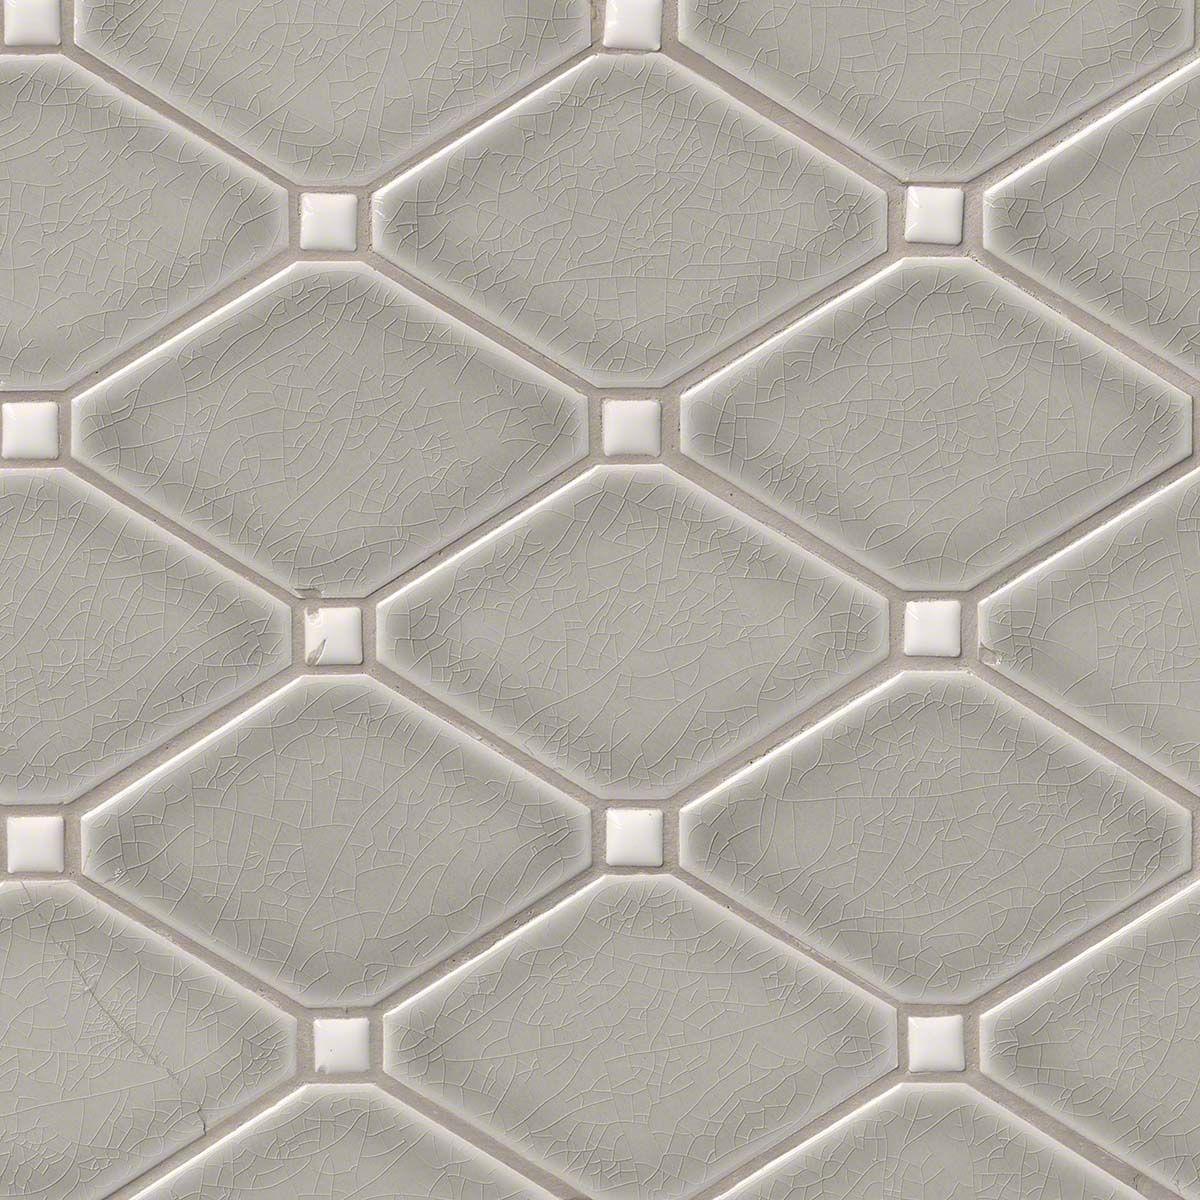 Backsplash Accent Panel Option Dove Gray Diamond 8mm